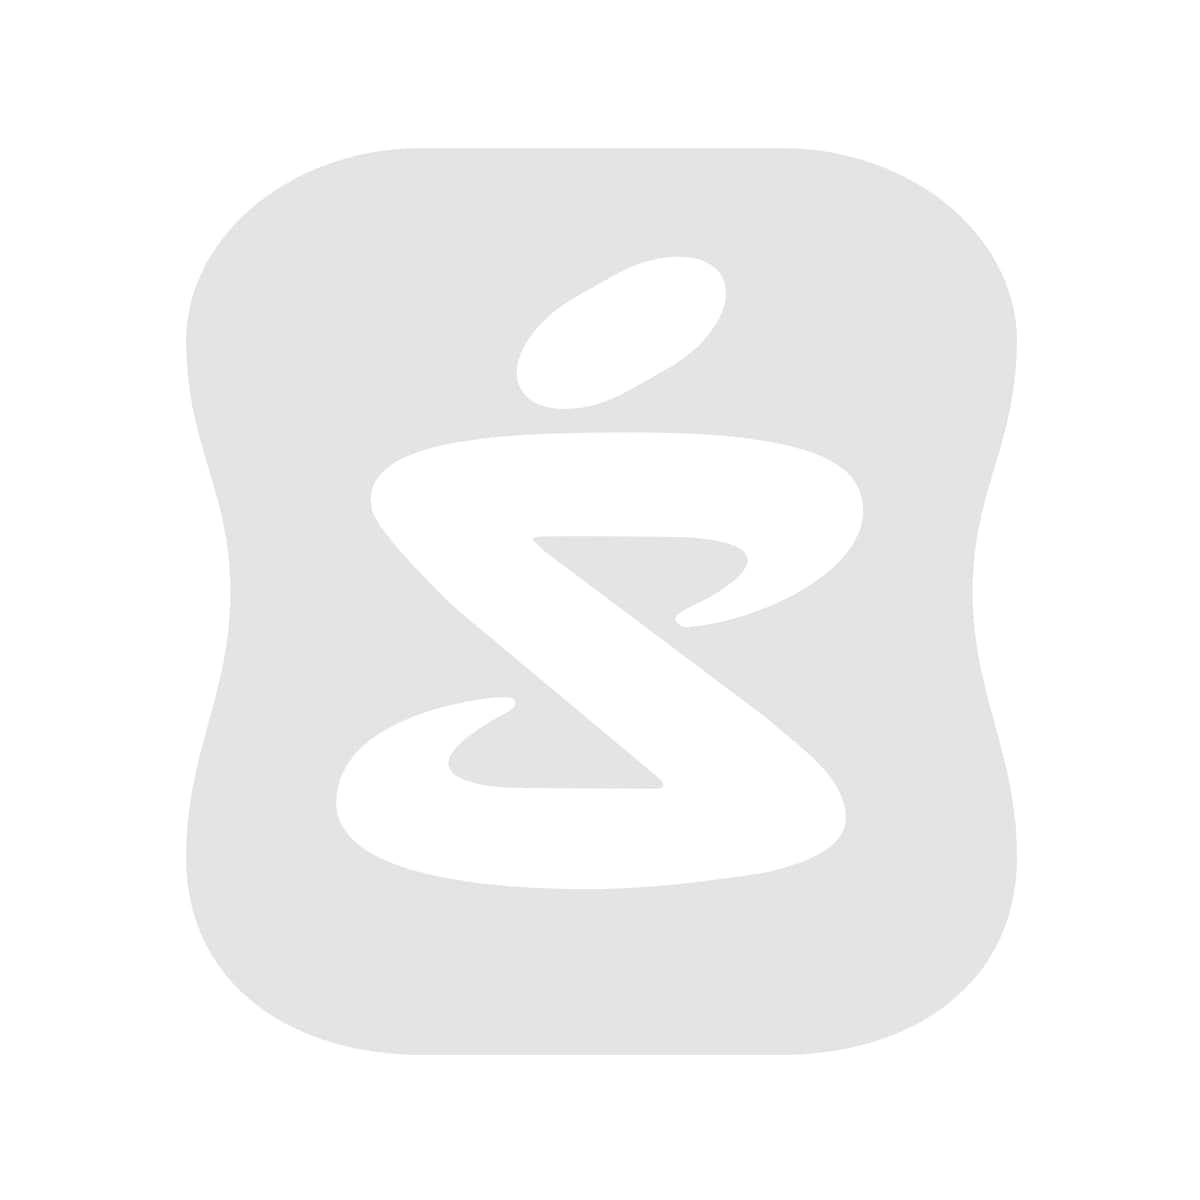 Bebiko 1 Extra Care Comfort